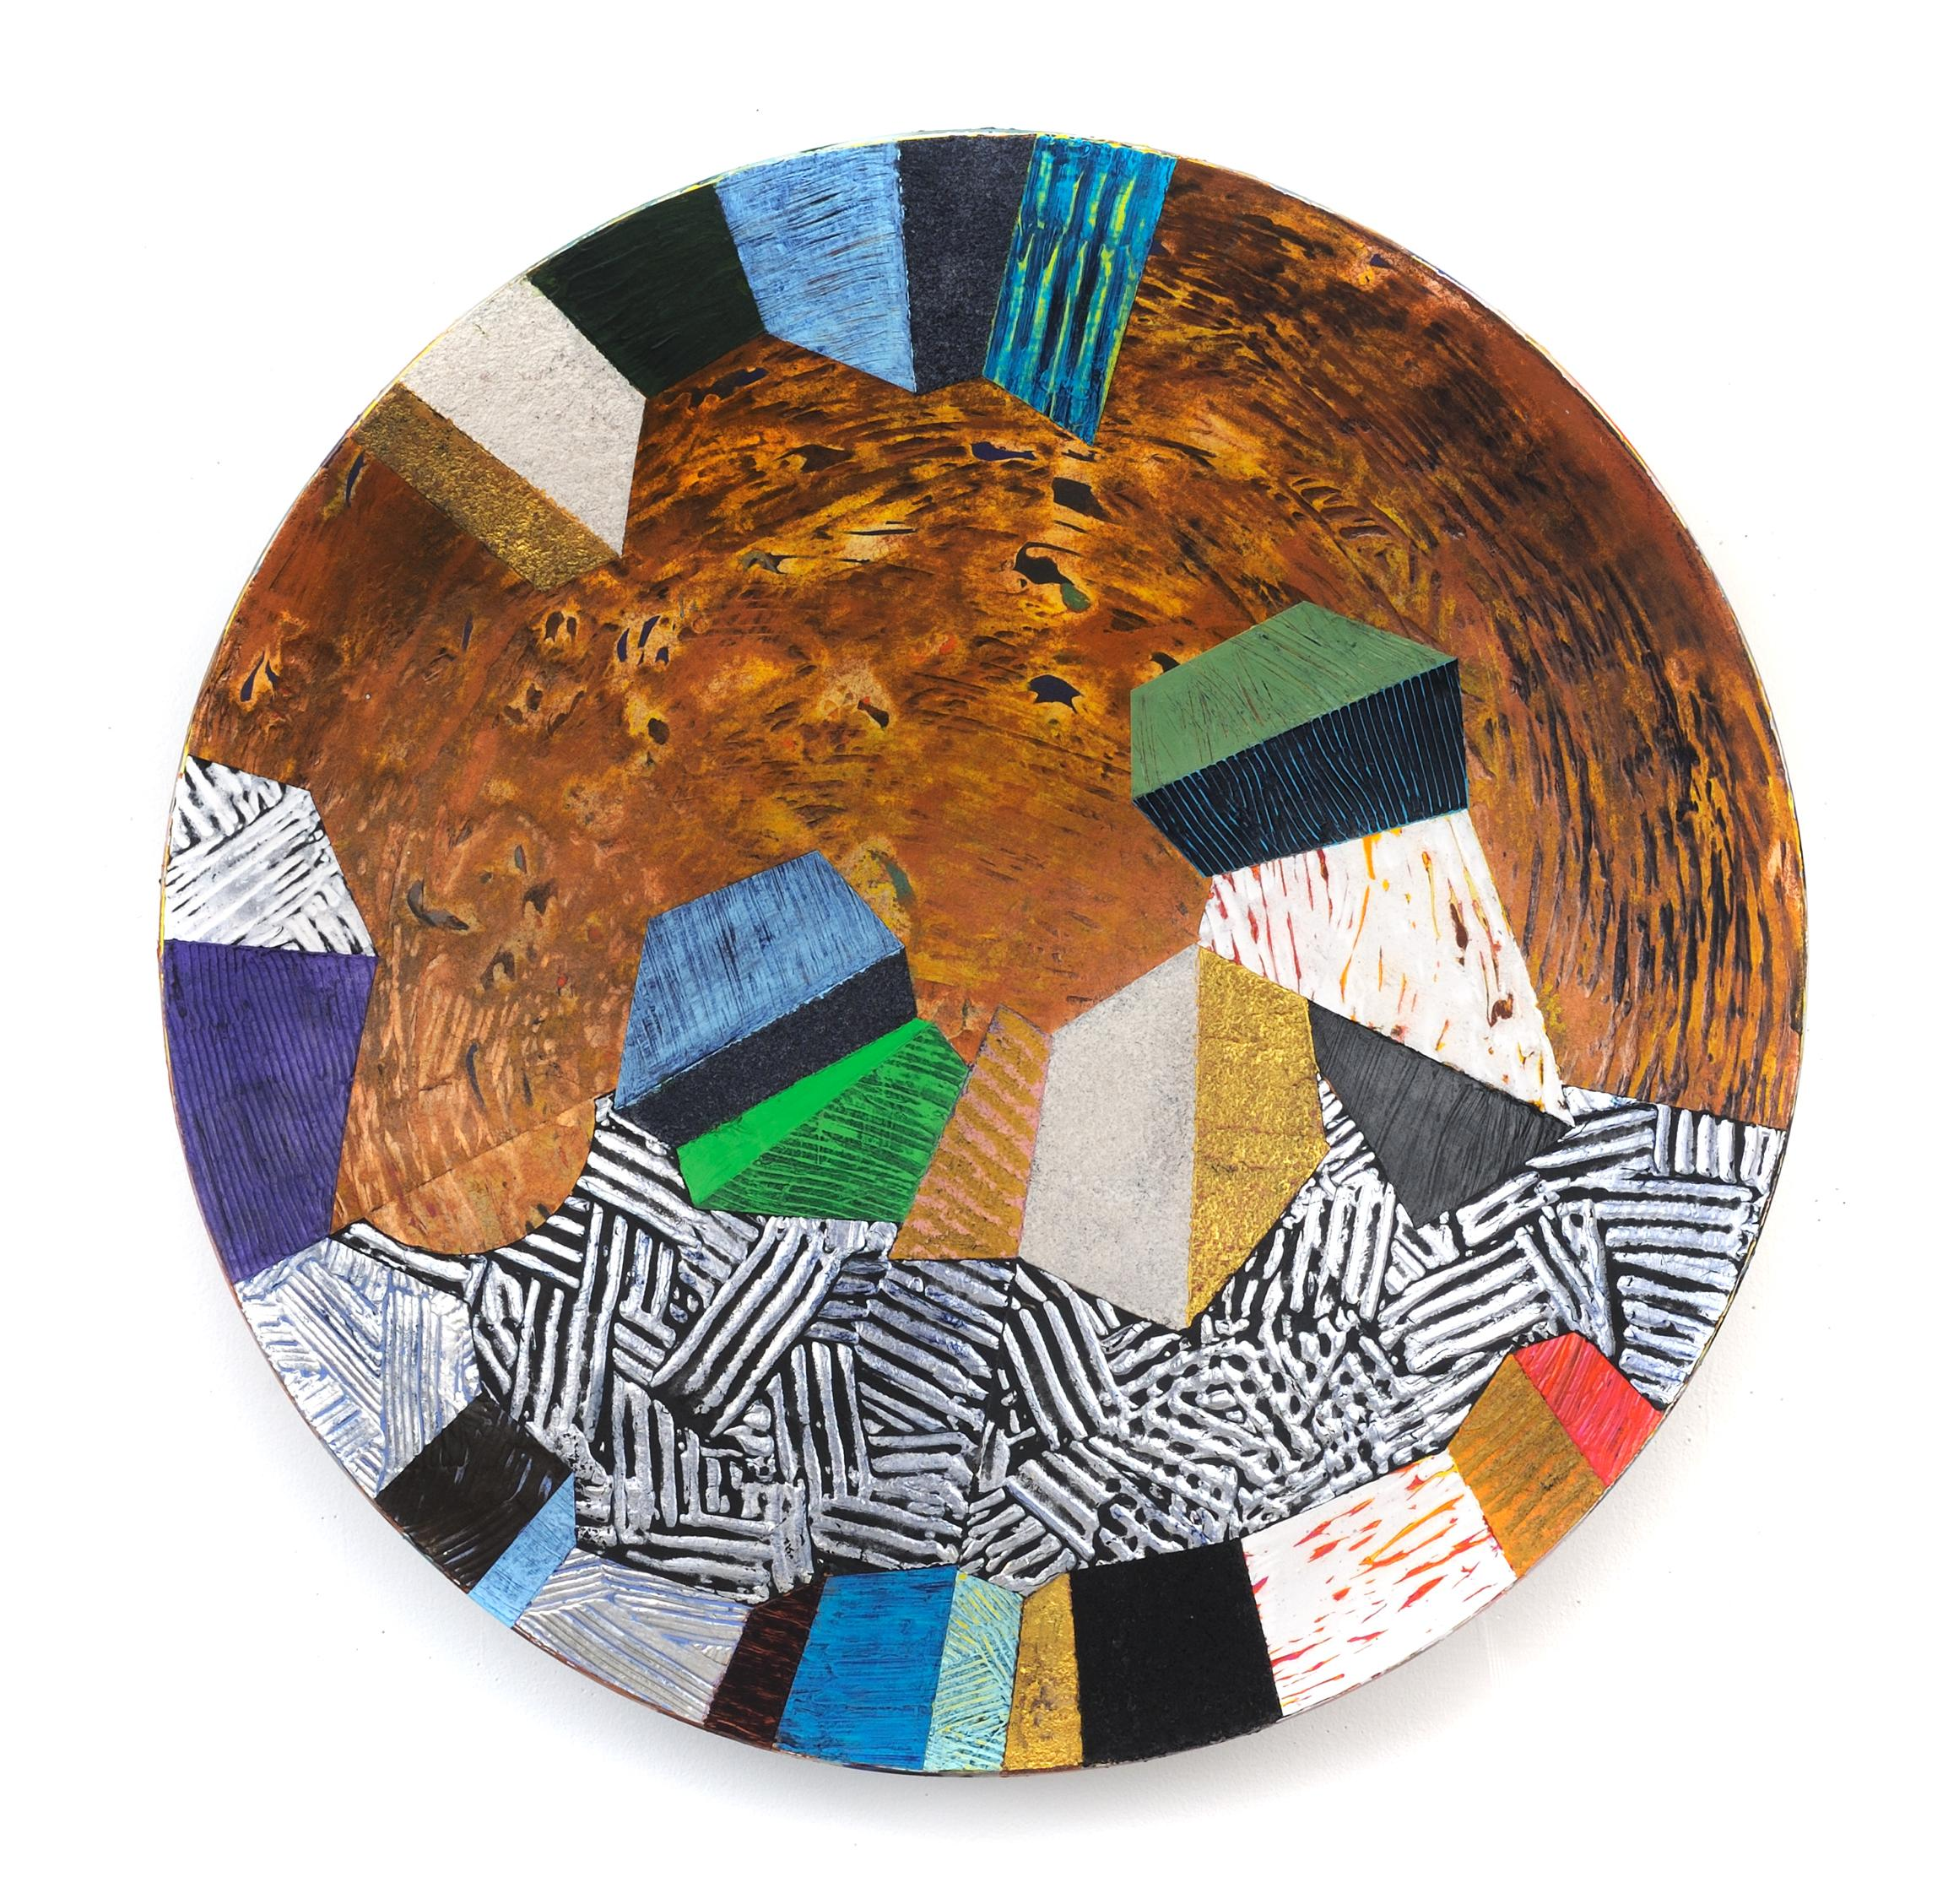 "Vessel #4, multicolored mixed media sculptural piece, textured, 22"" diameter"